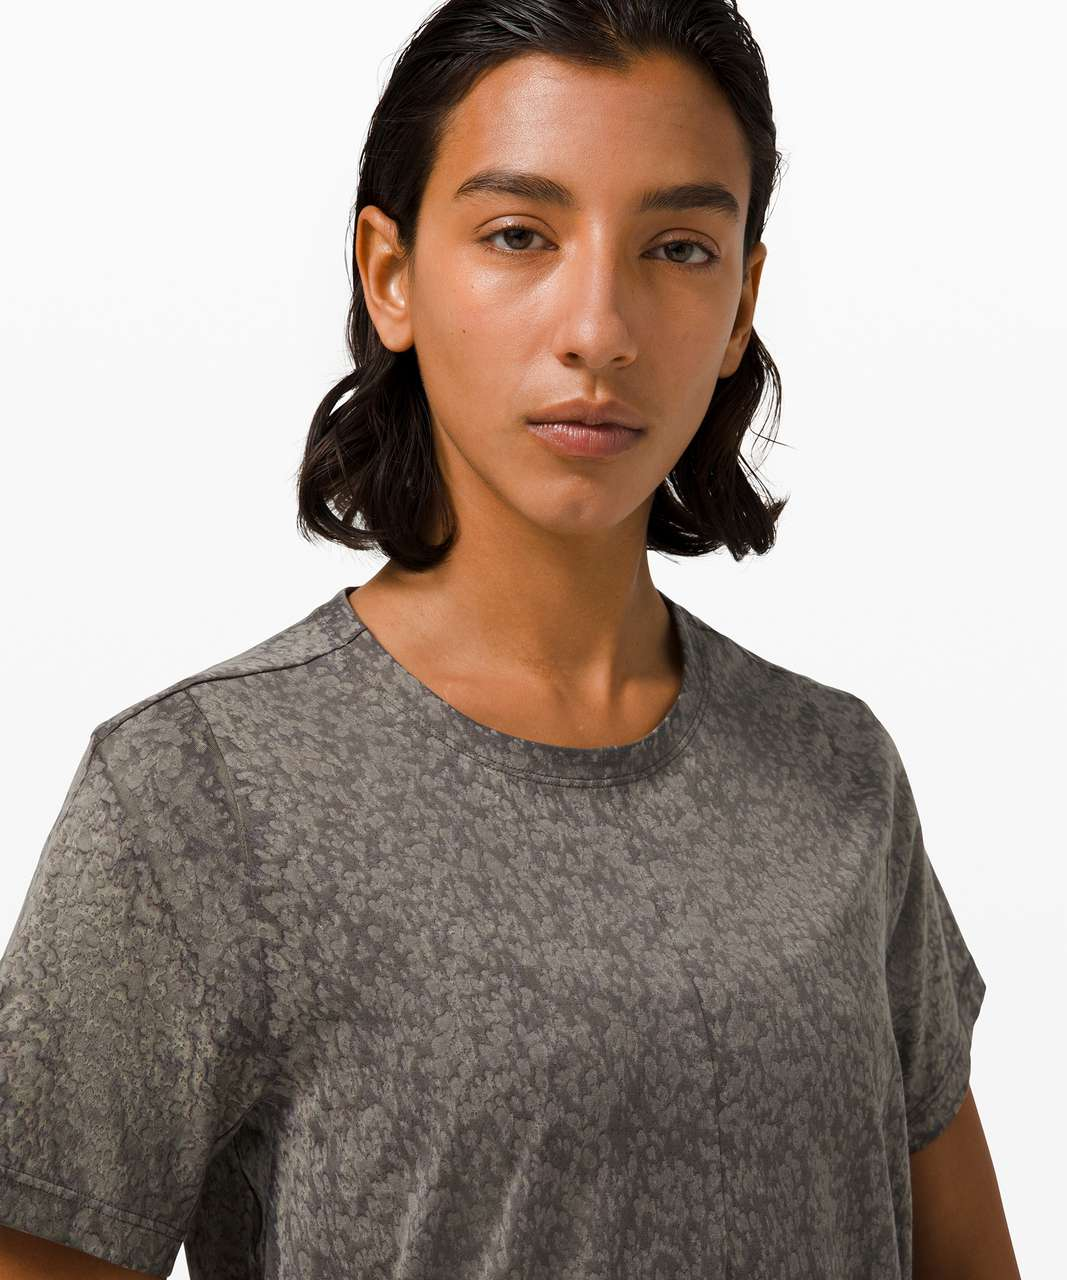 Lululemon Skreppa Short Sleeve *lululemon lab - Graphite Grey Bloom Dye